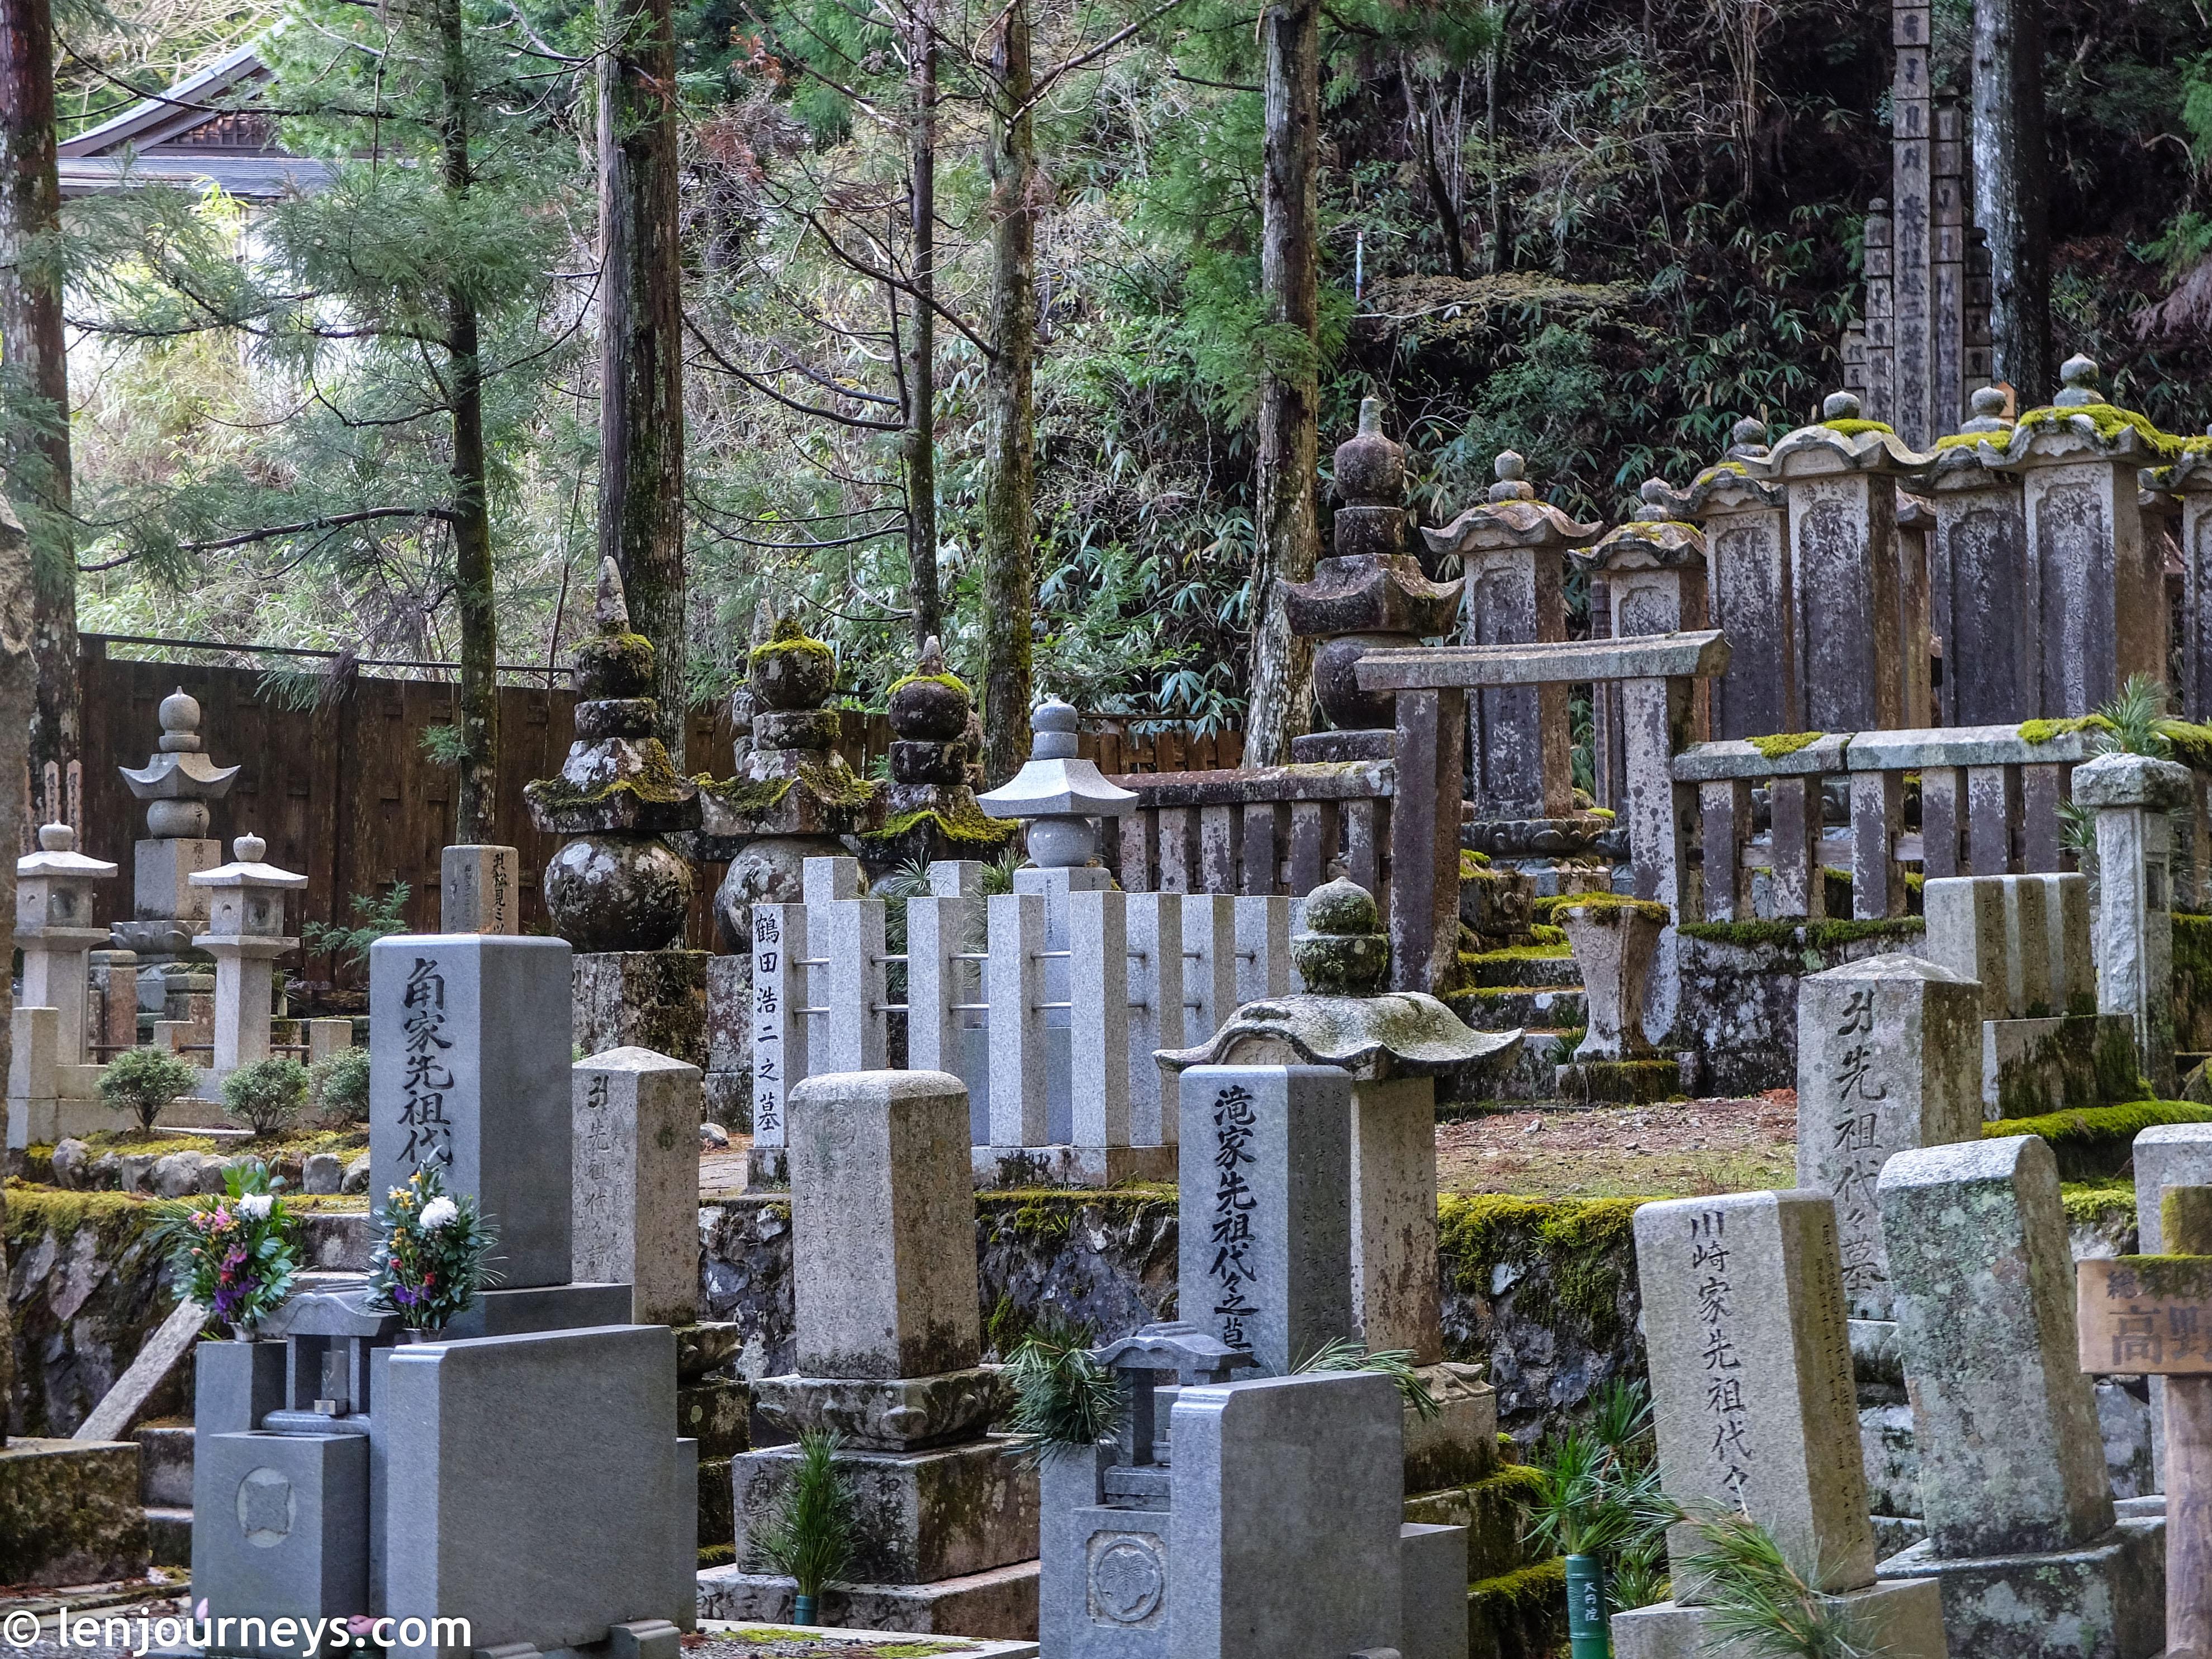 Gravestones in Okunoin Cemetery